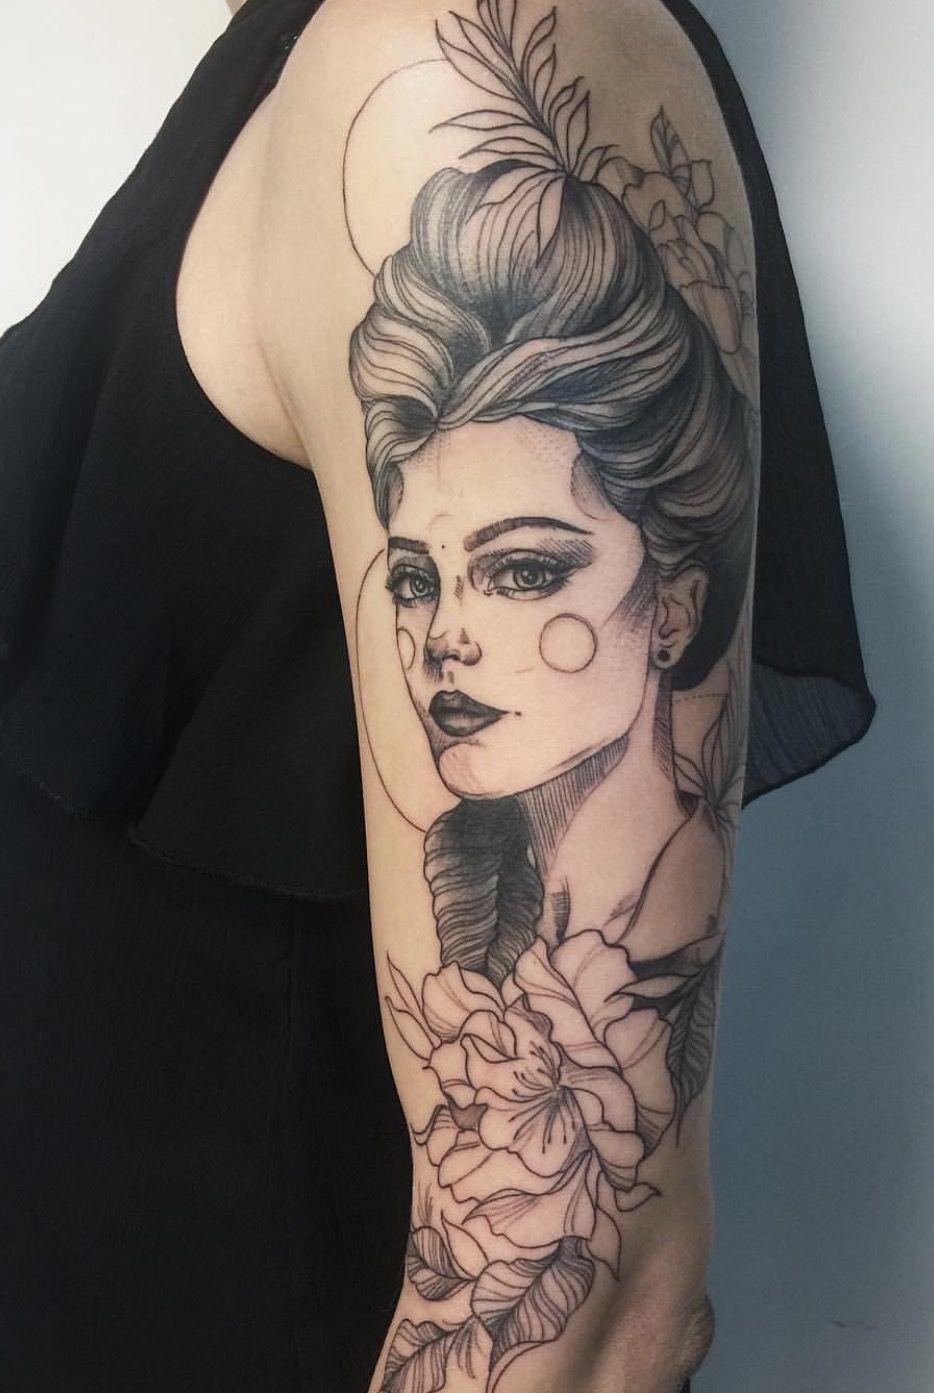 Cool tattoos for a girl girl portrait tattoo  Τατουάζ  pinterest  portrait tattoos